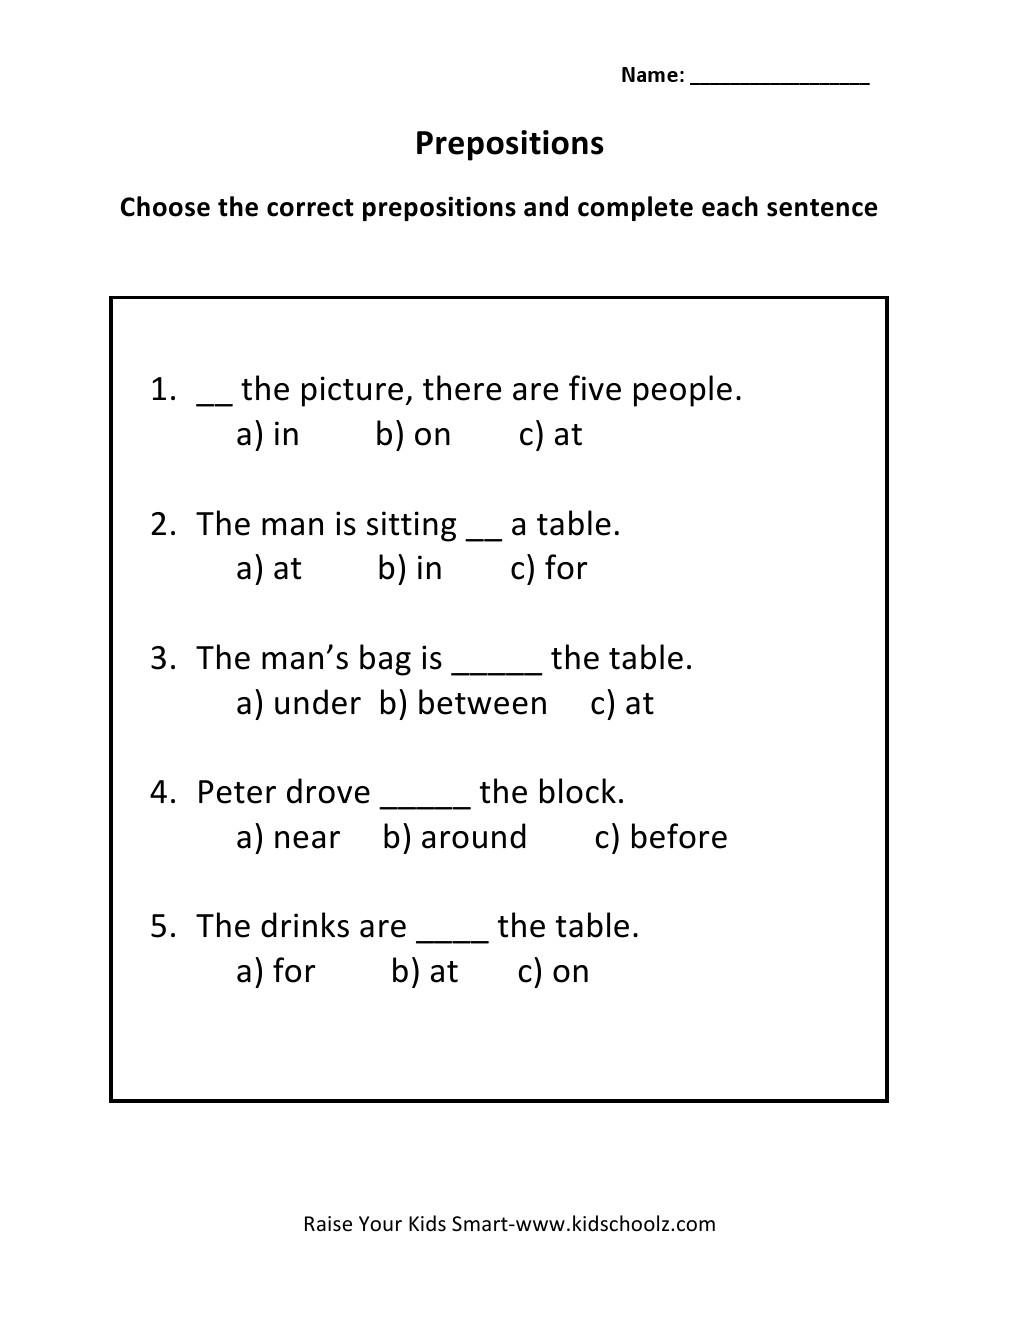 Prepositions Worksheets For Grade 2 The Best Worksheets Image